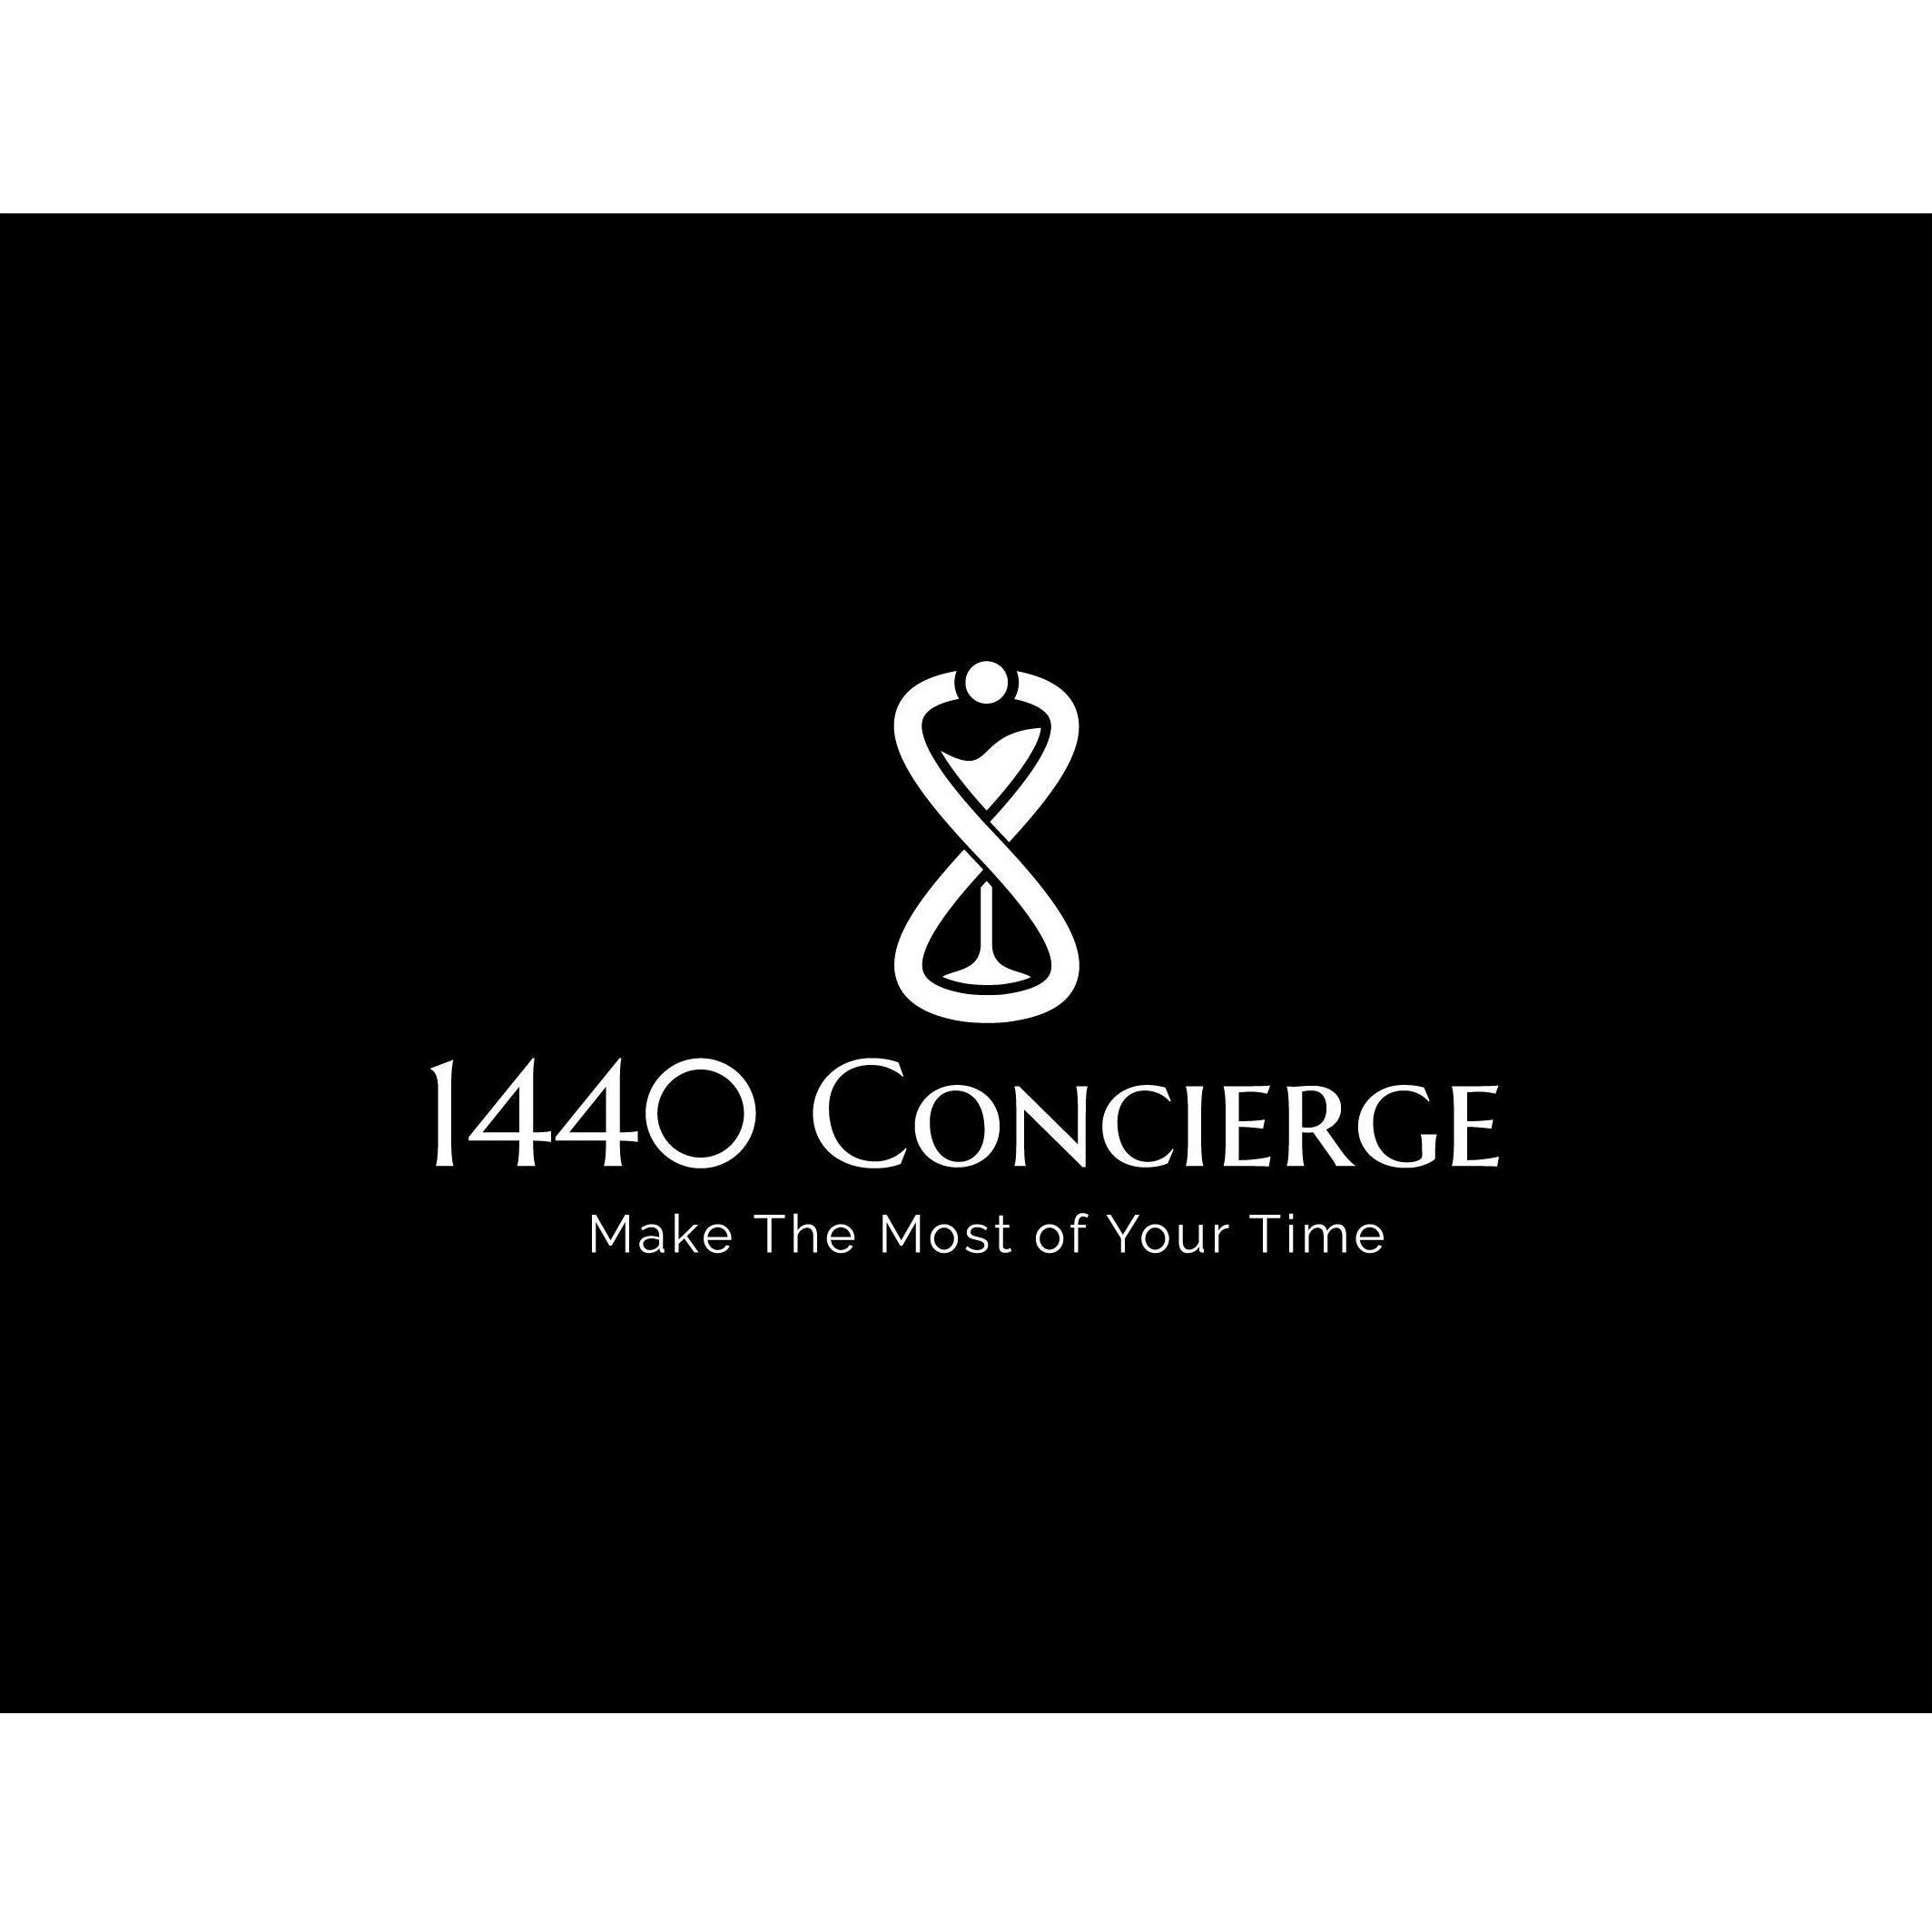 1440 Concierge, LLC